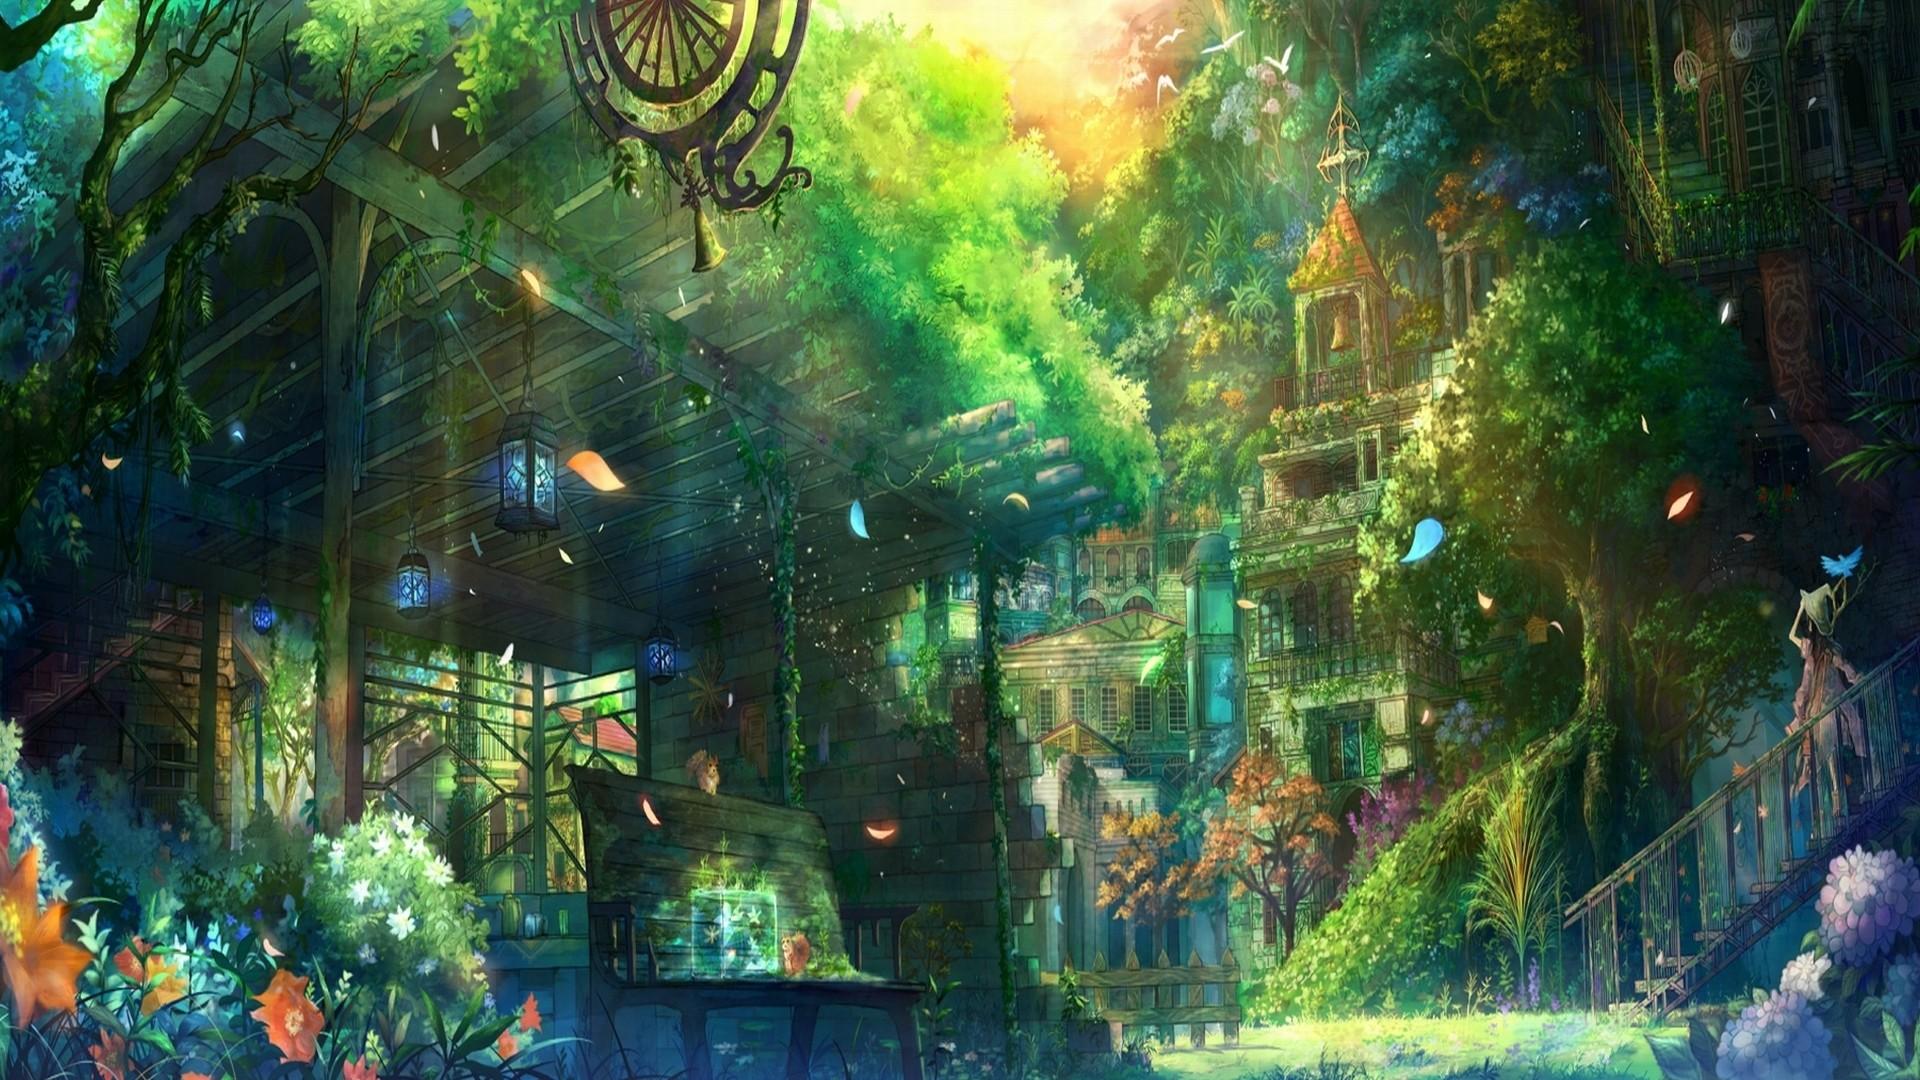 Tags: city, anime